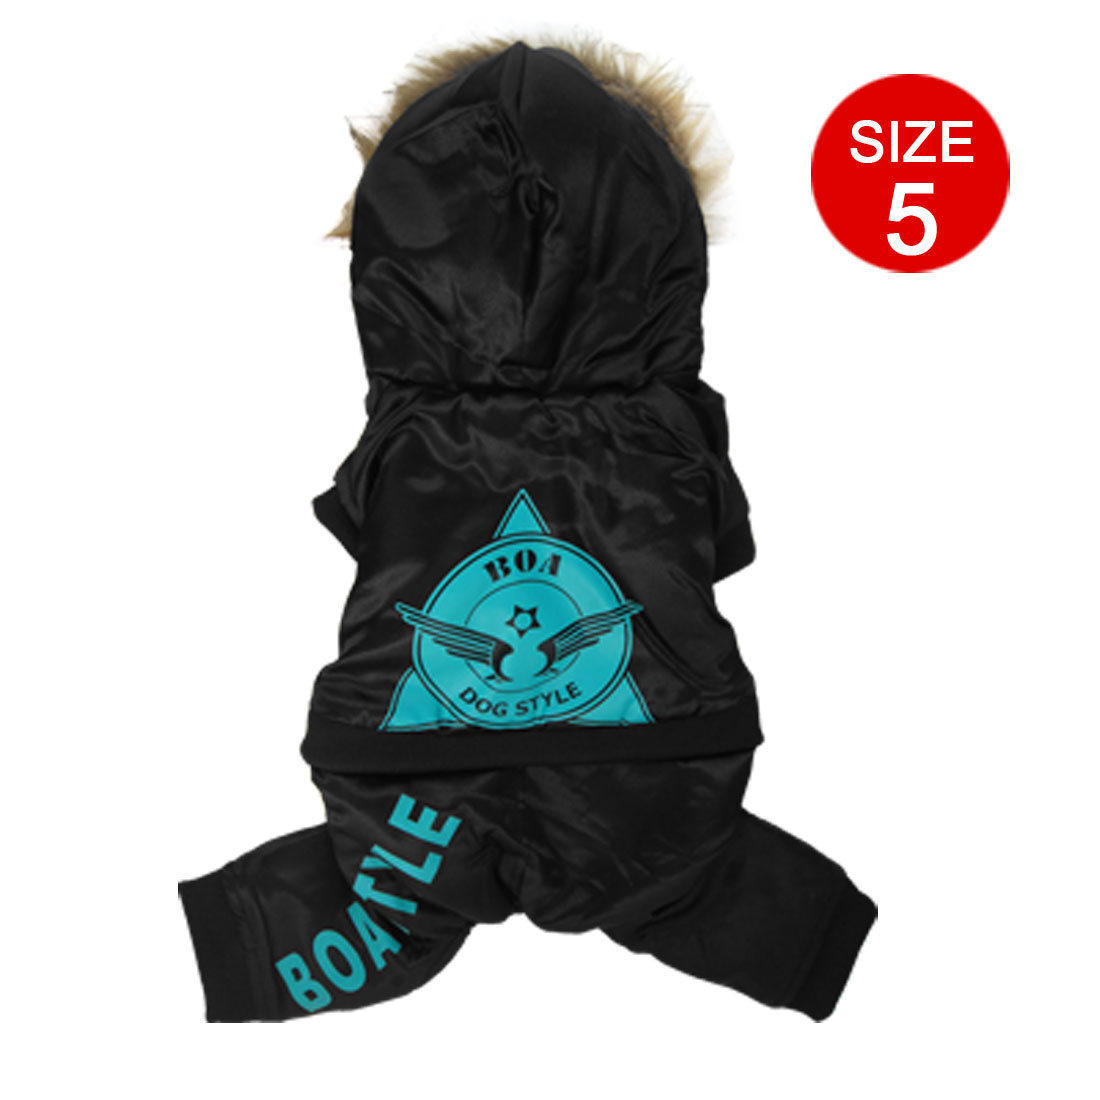 Black Winter Warm Pet Puppy Dog Apparel Hoodies Coat Jumper Jacket Size XXL